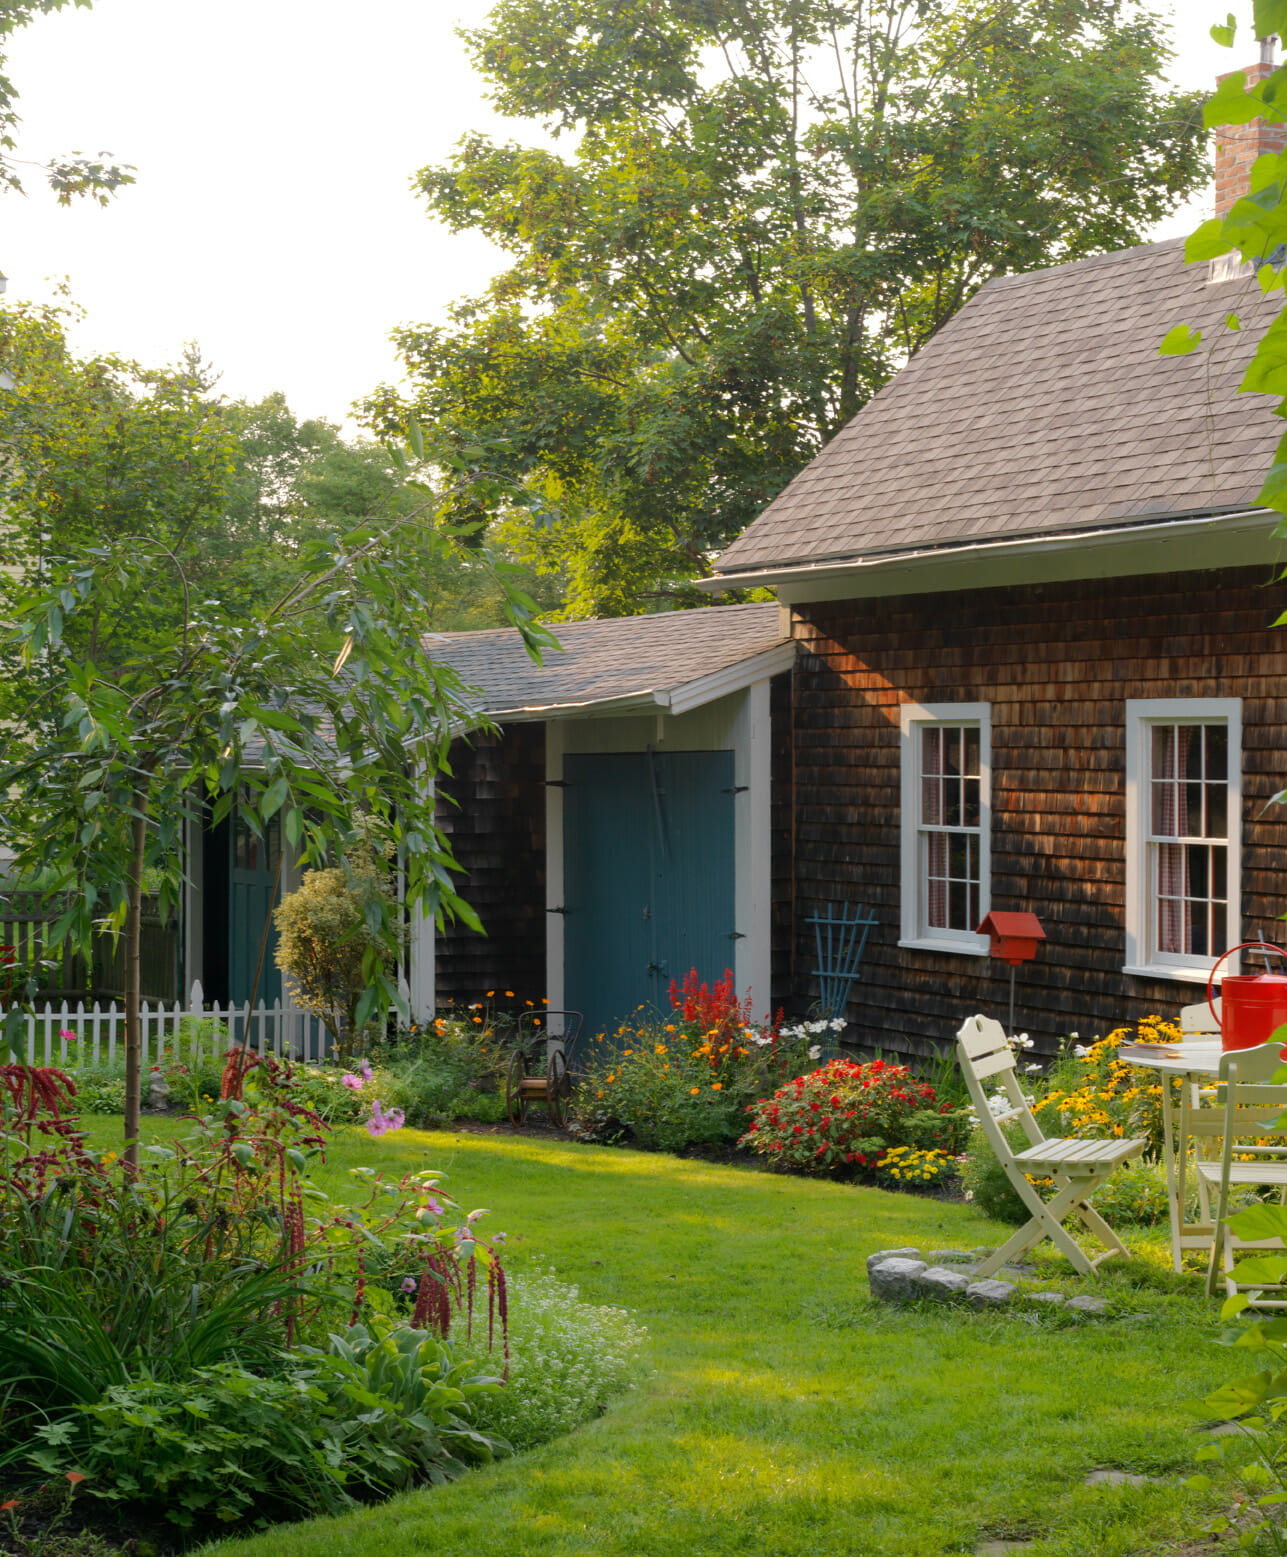 Home Outside Project: Family-Friendly DIY Backyard